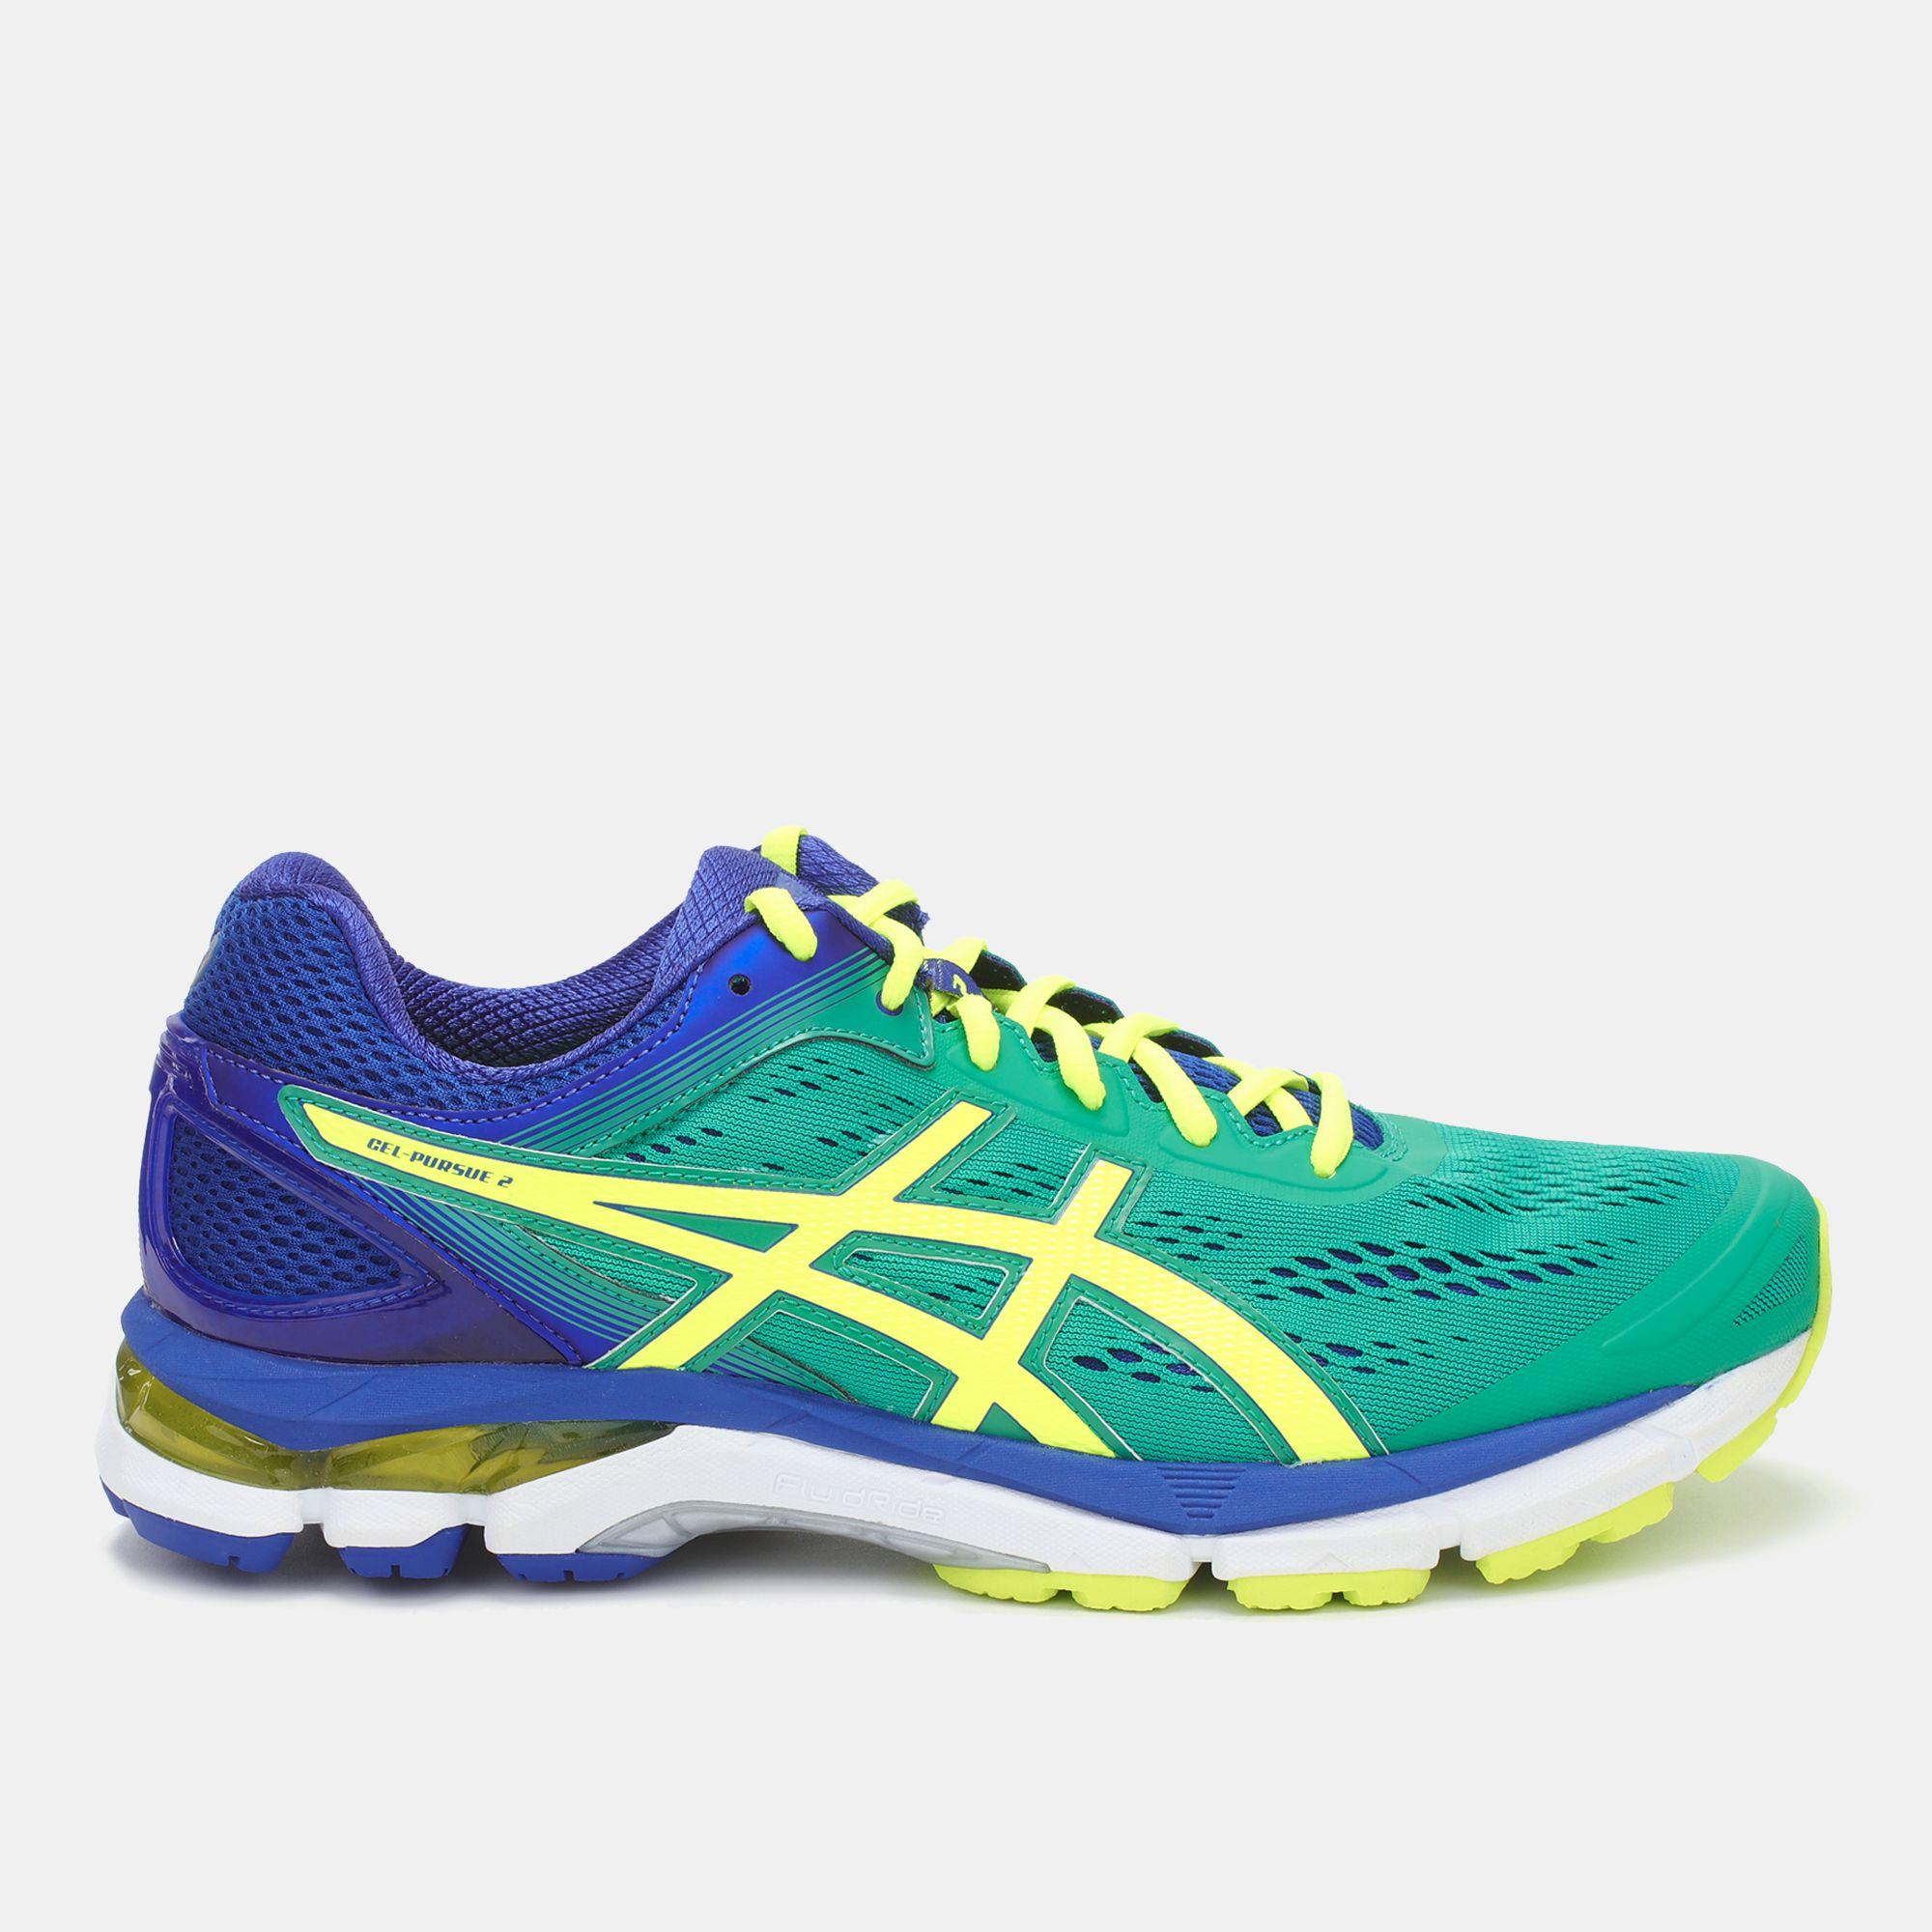 Shop Green Asics Gel Pursue 2 Running Shoe for Mens by Asics